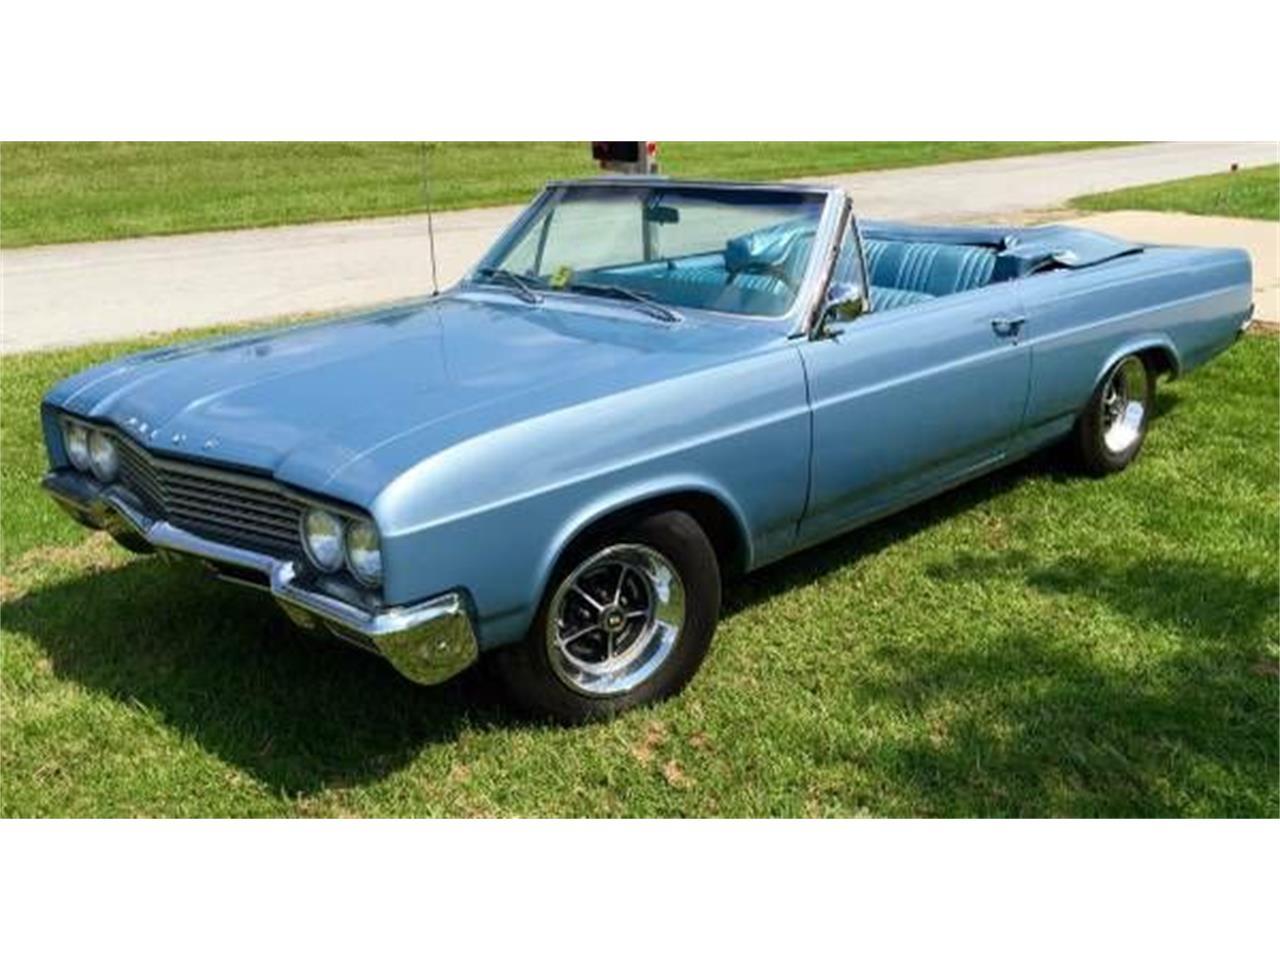 For Sale: 1965 Buick Skylark in Cadillac, Michigan